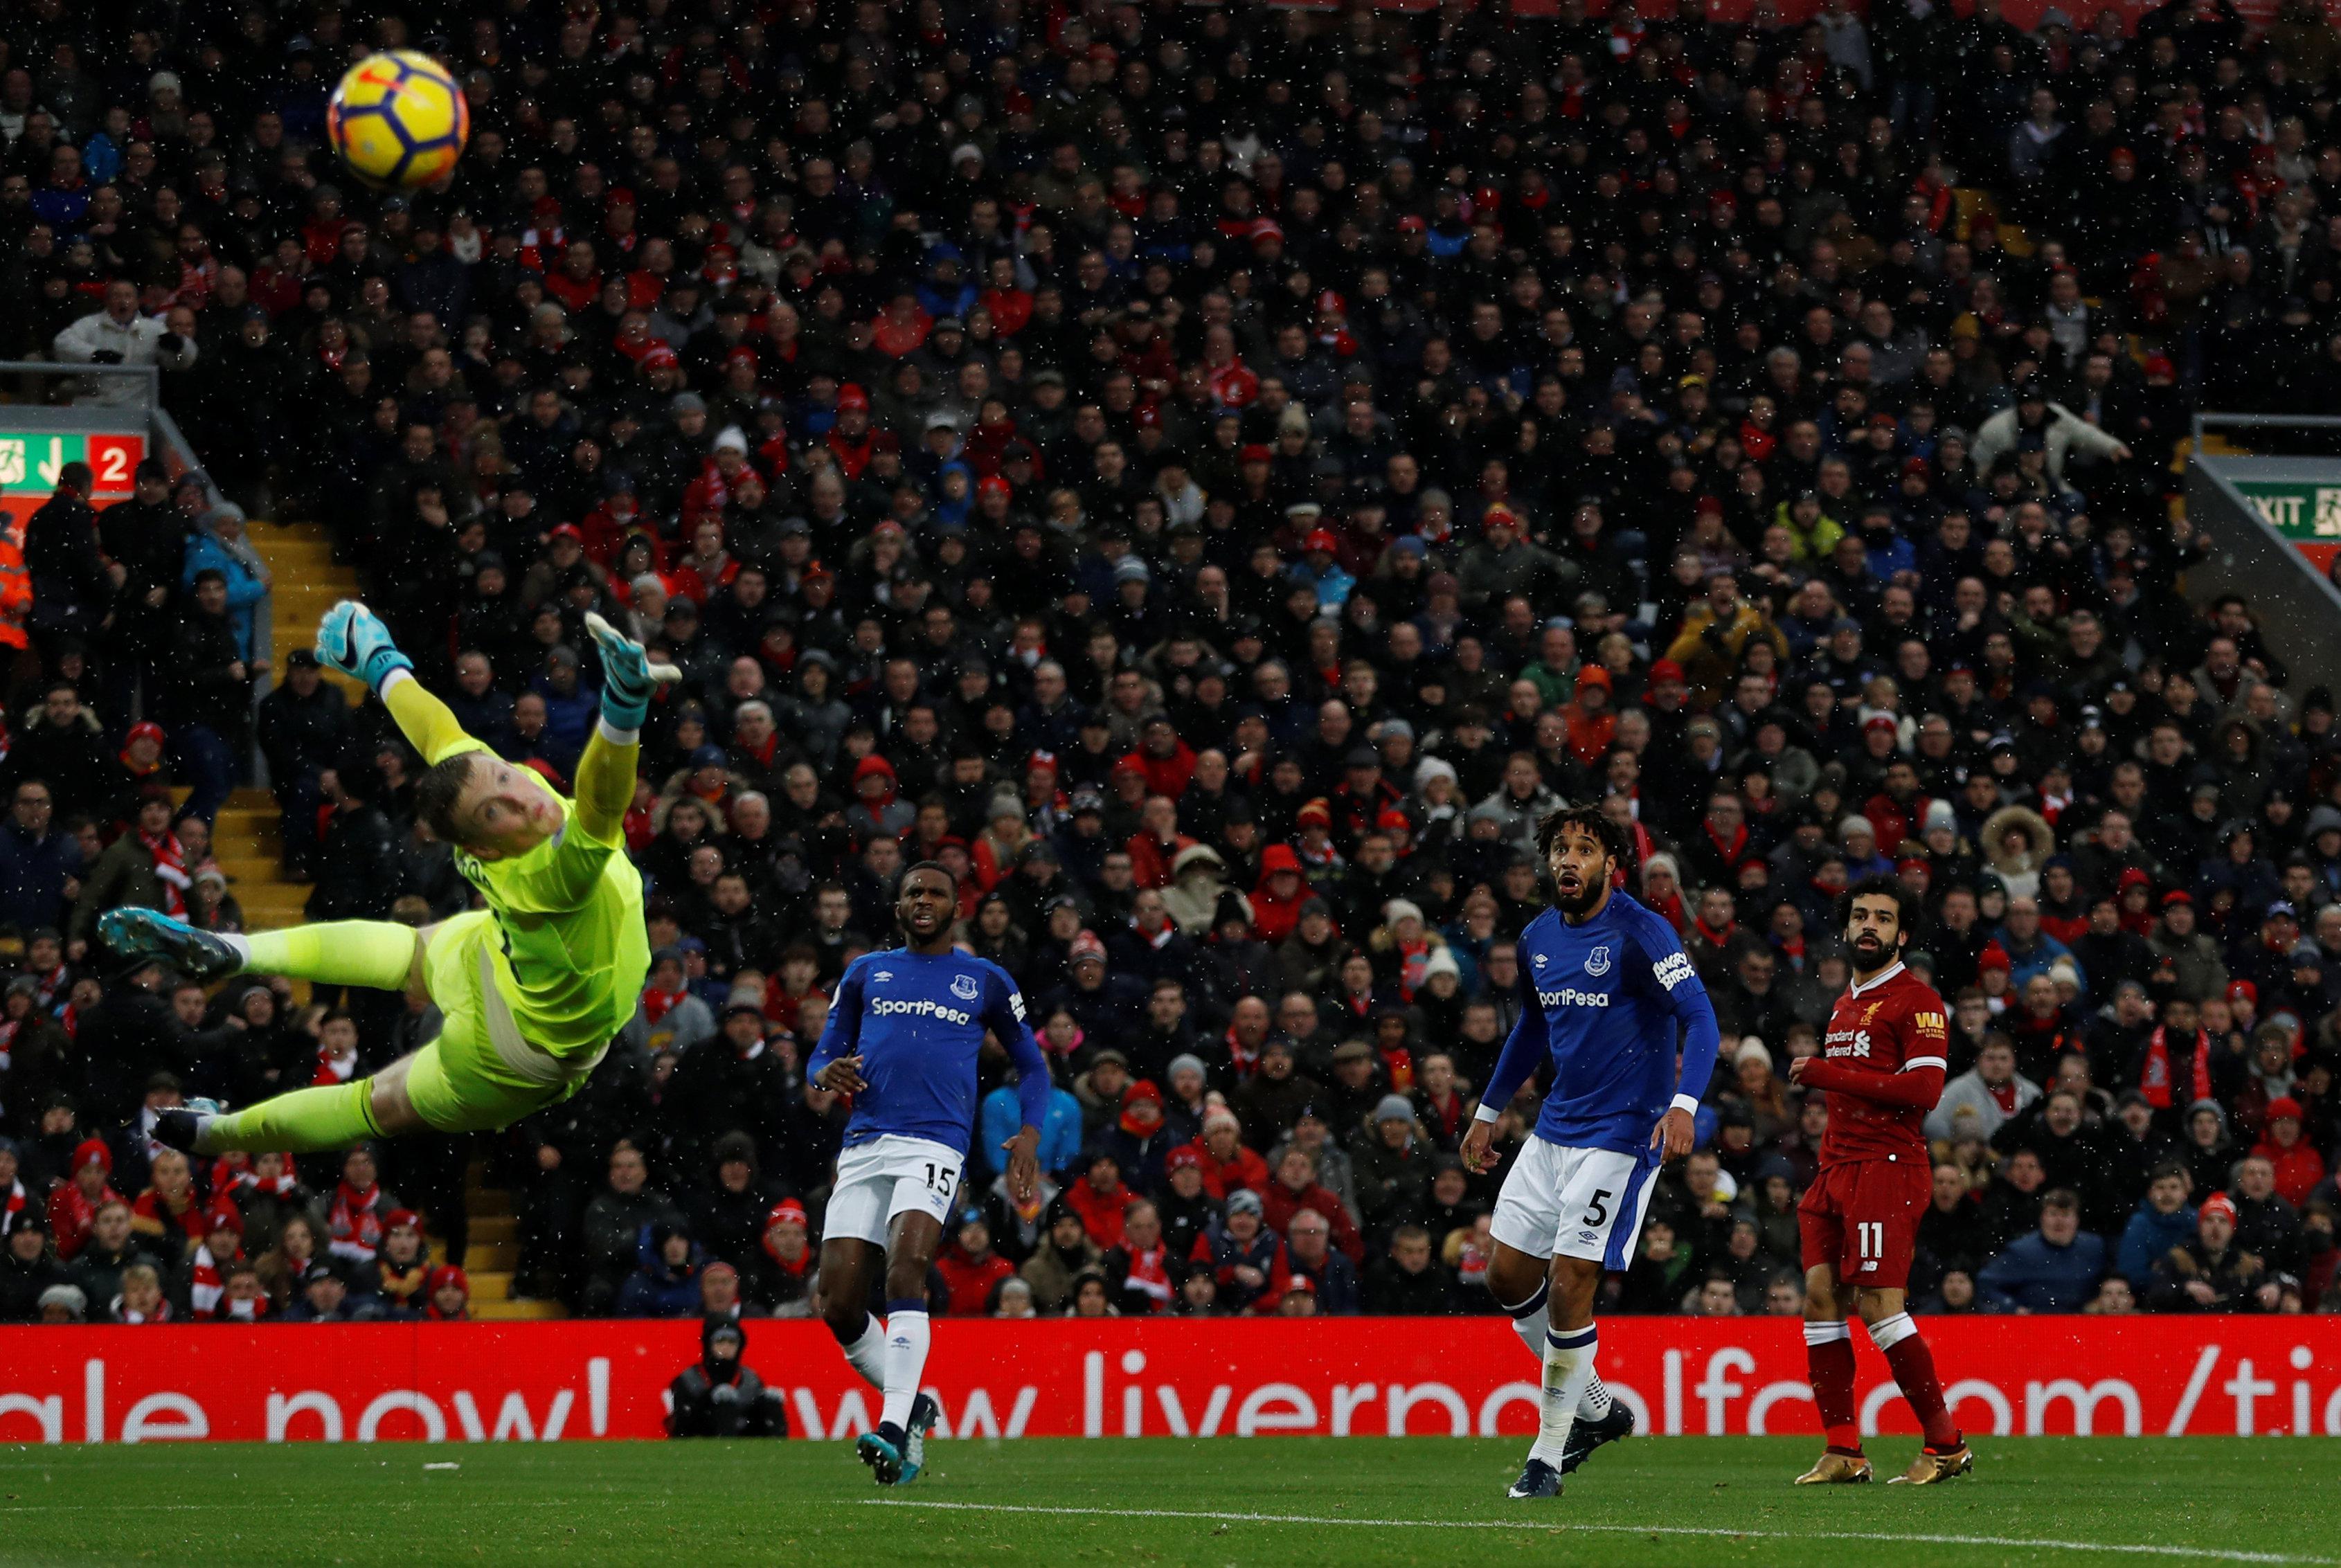 Salah's beauty against Everton